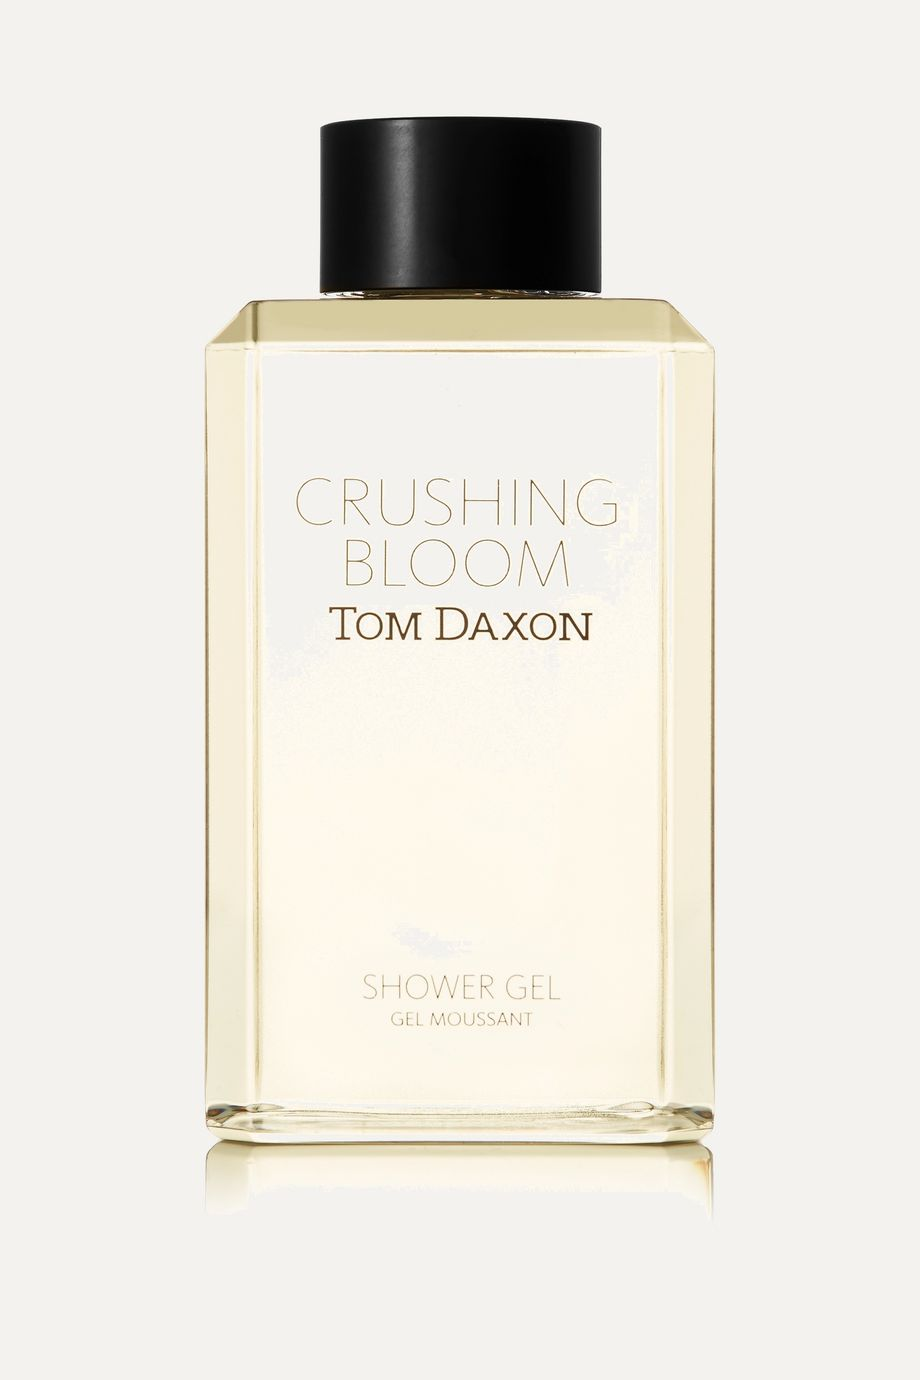 Tom Daxon Crushing Bloom Shower Gel, 250ml